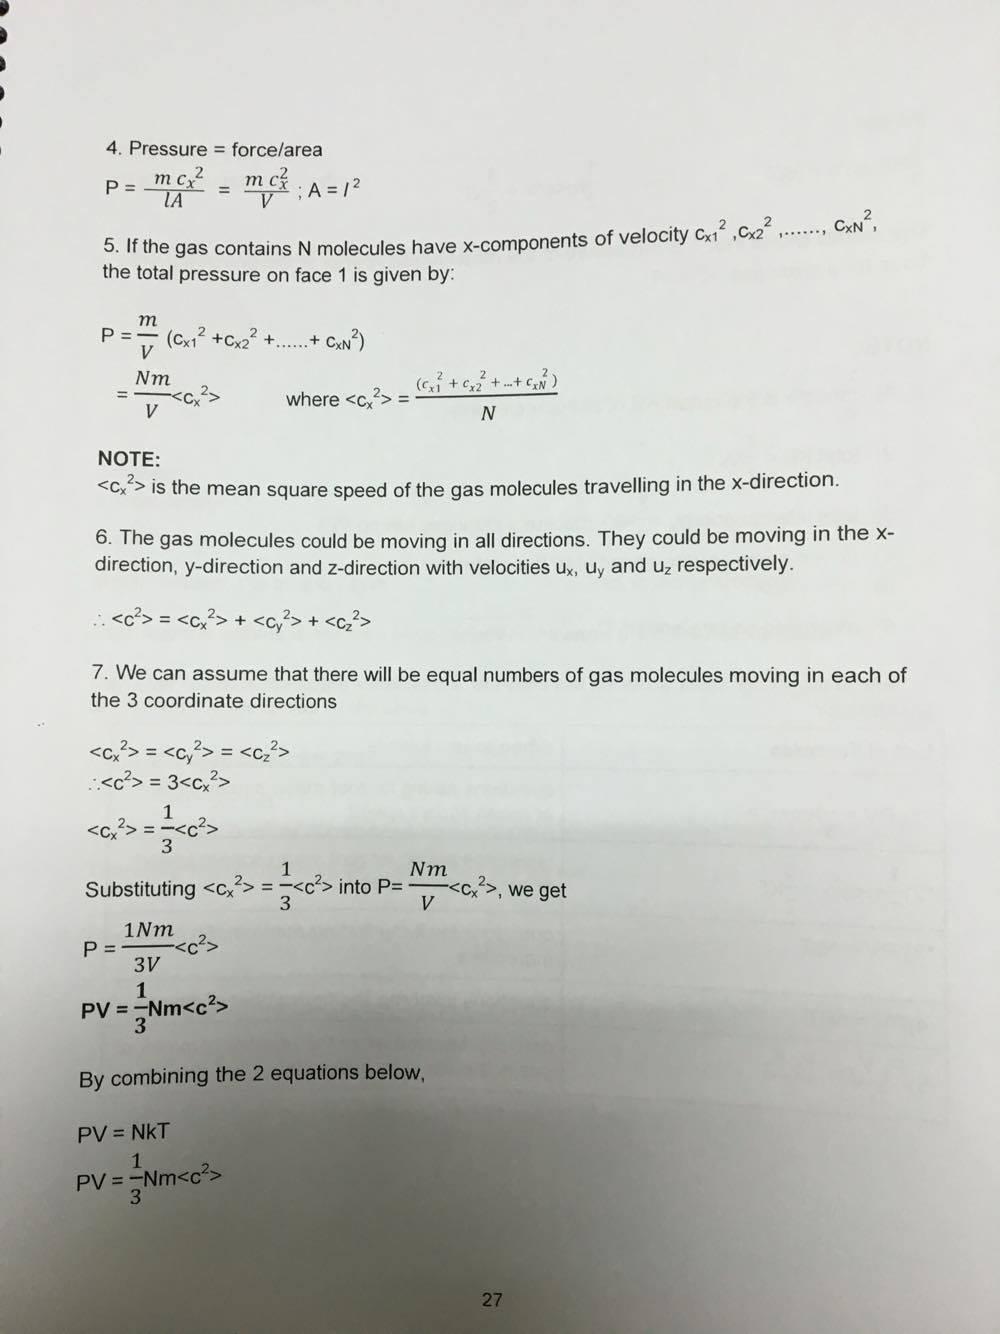 A Level Notes - mr sai mun